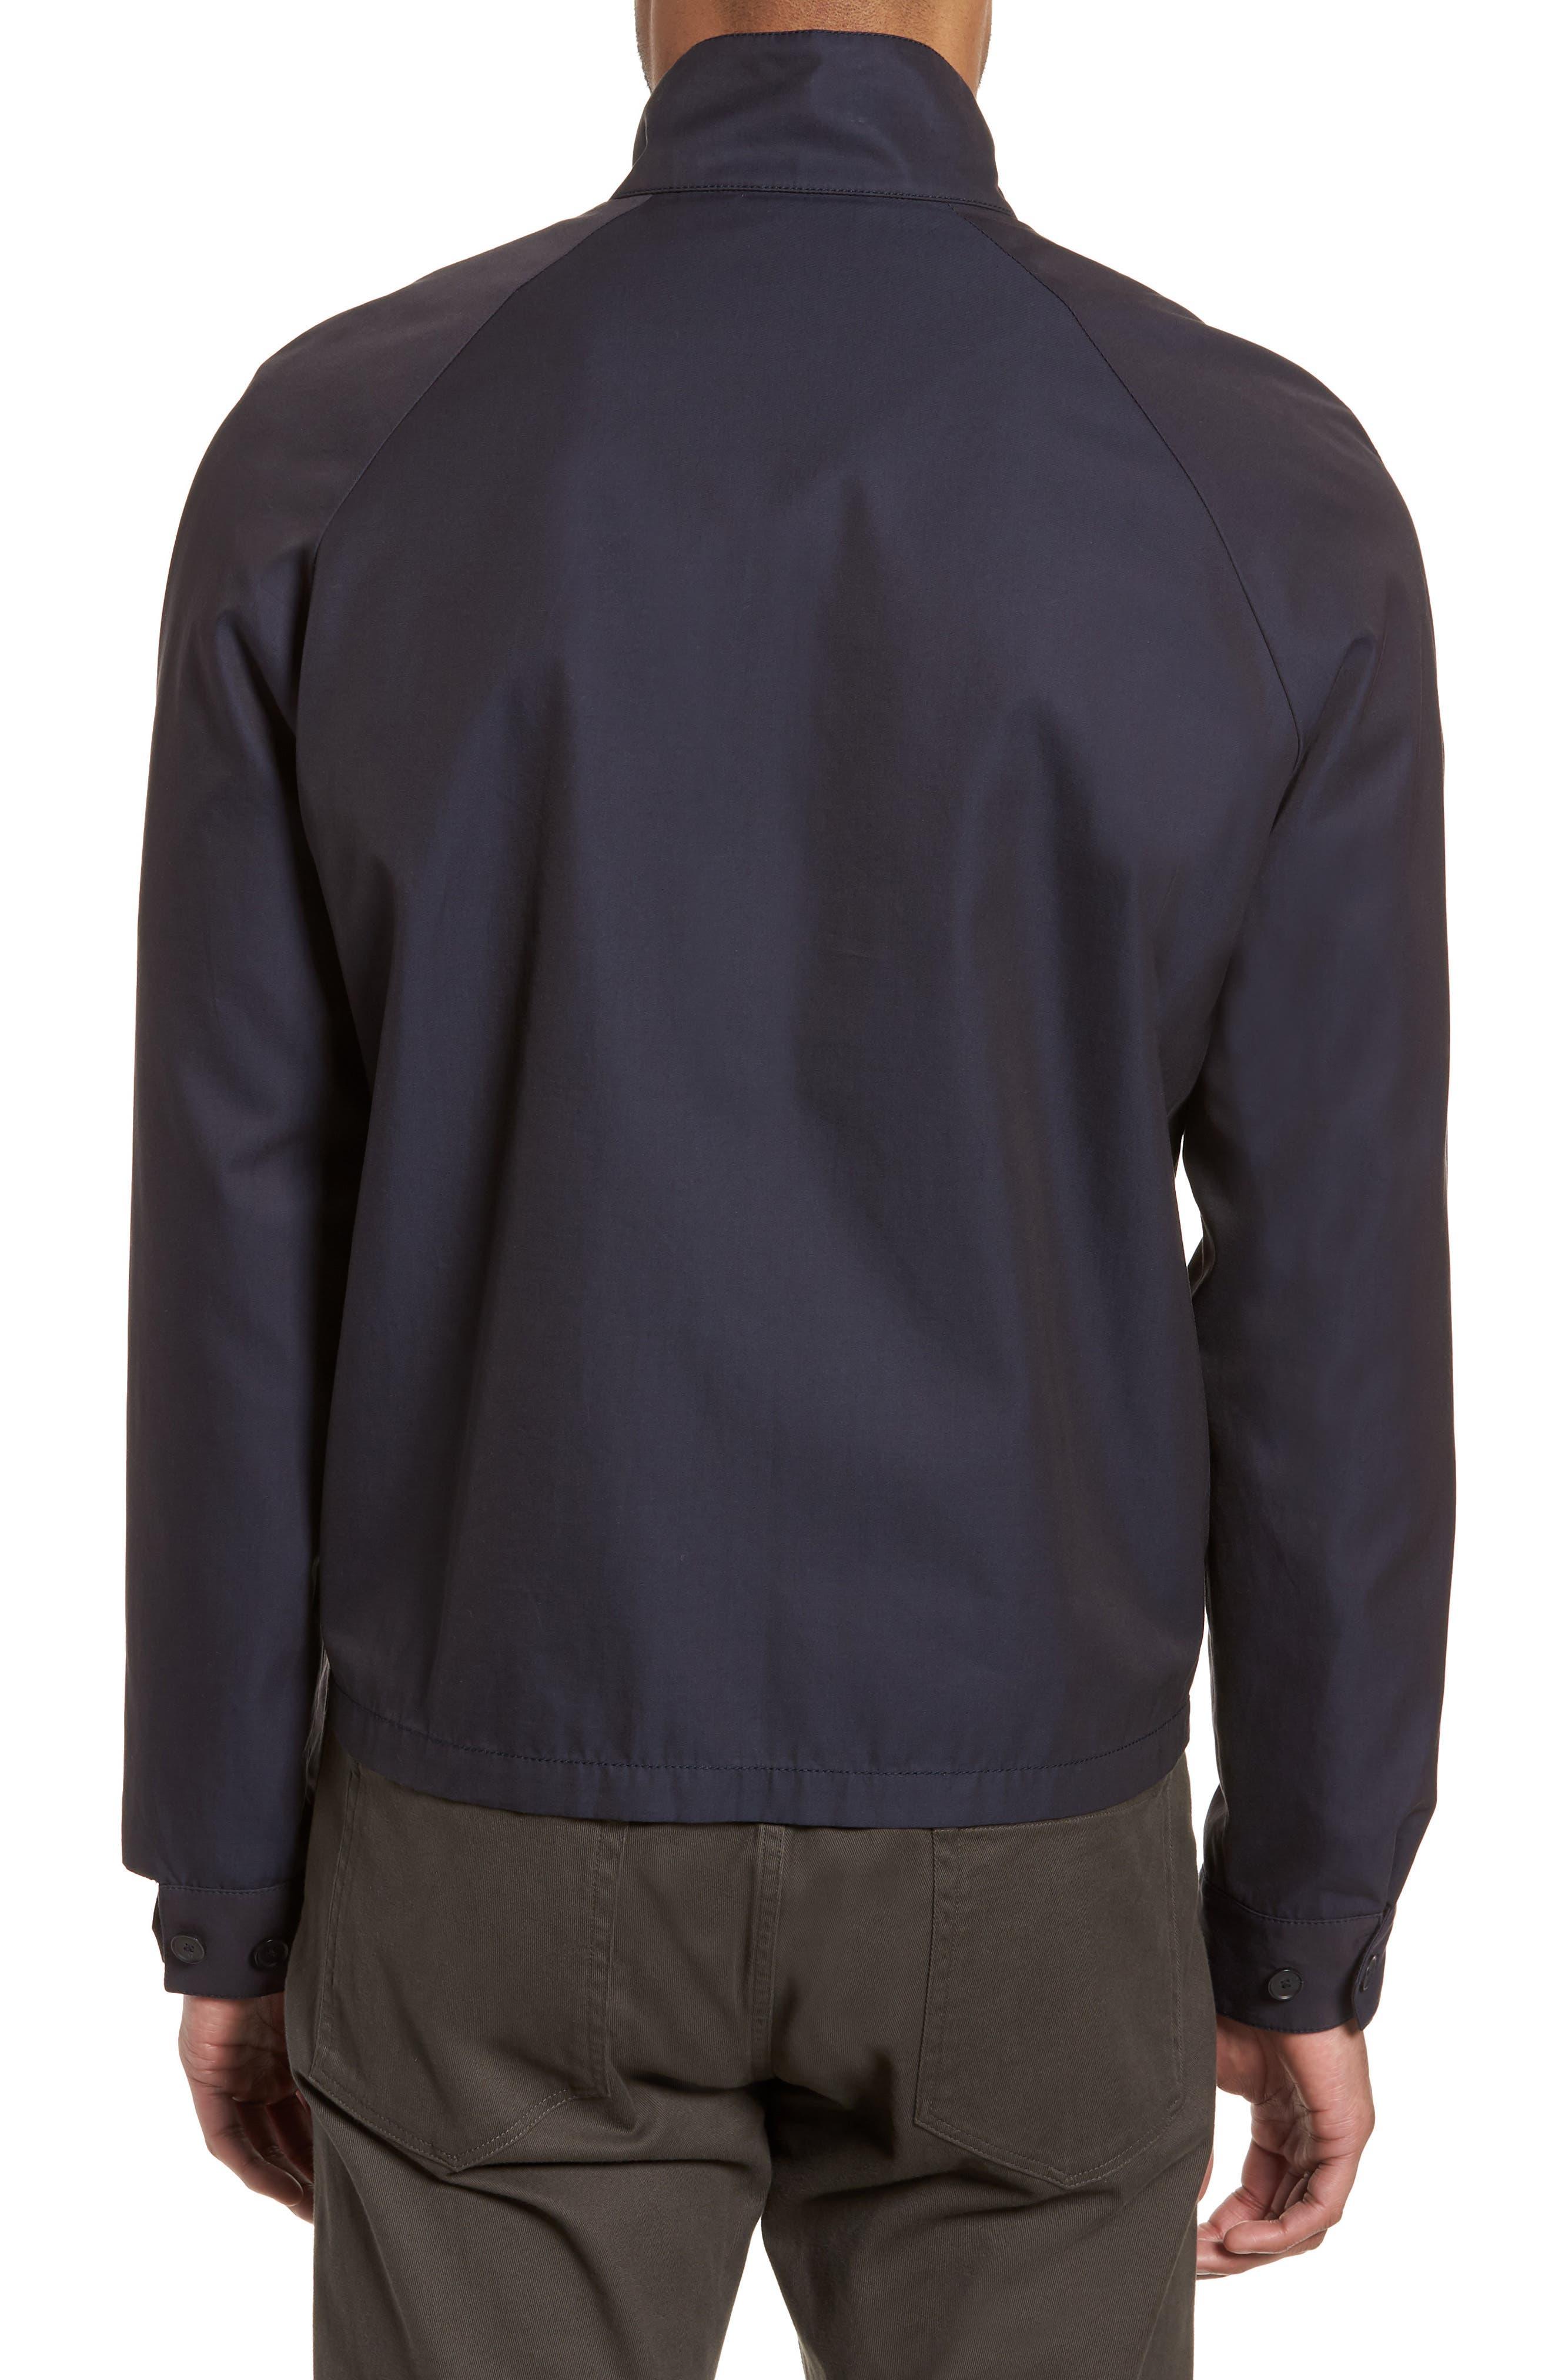 Regular Fit Jacket,                             Alternate thumbnail 2, color,                             NAVY